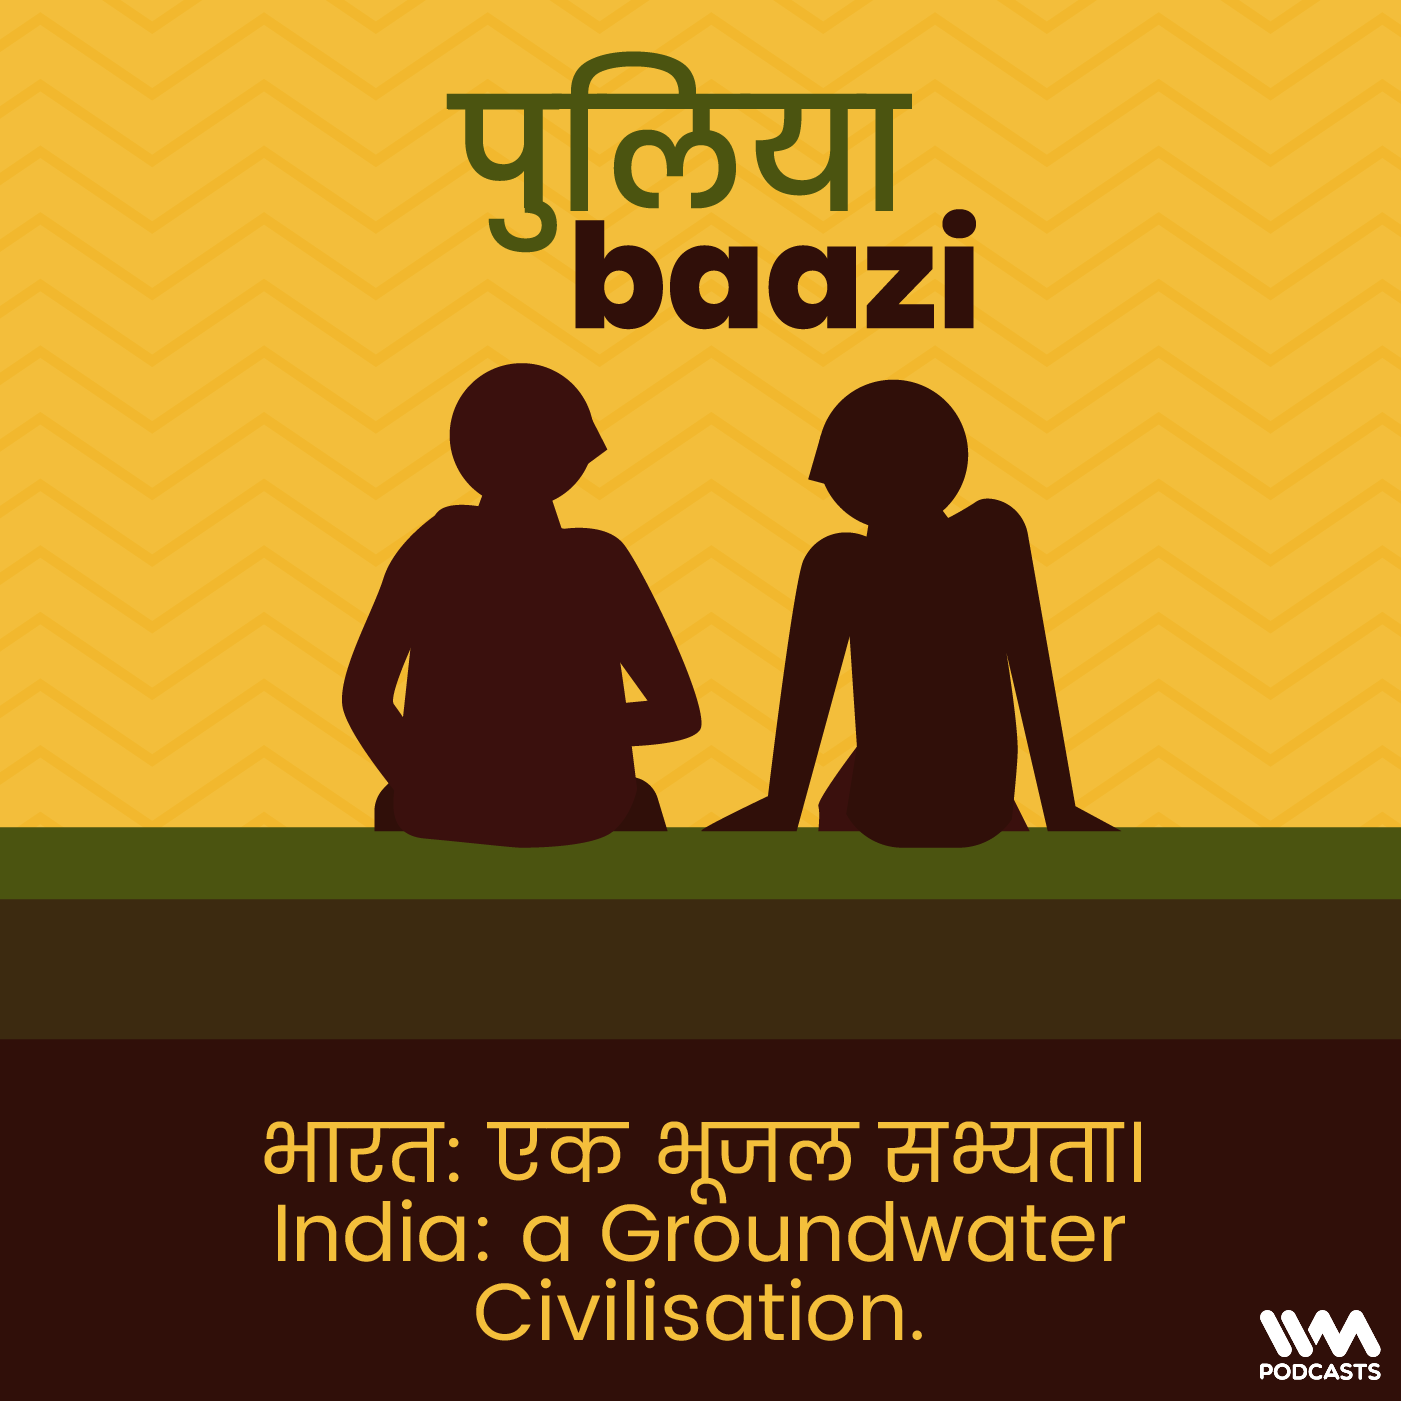 Ep. 93: भारत: एक भूजल सभ्यता। India: A Groundwater Civilisation.